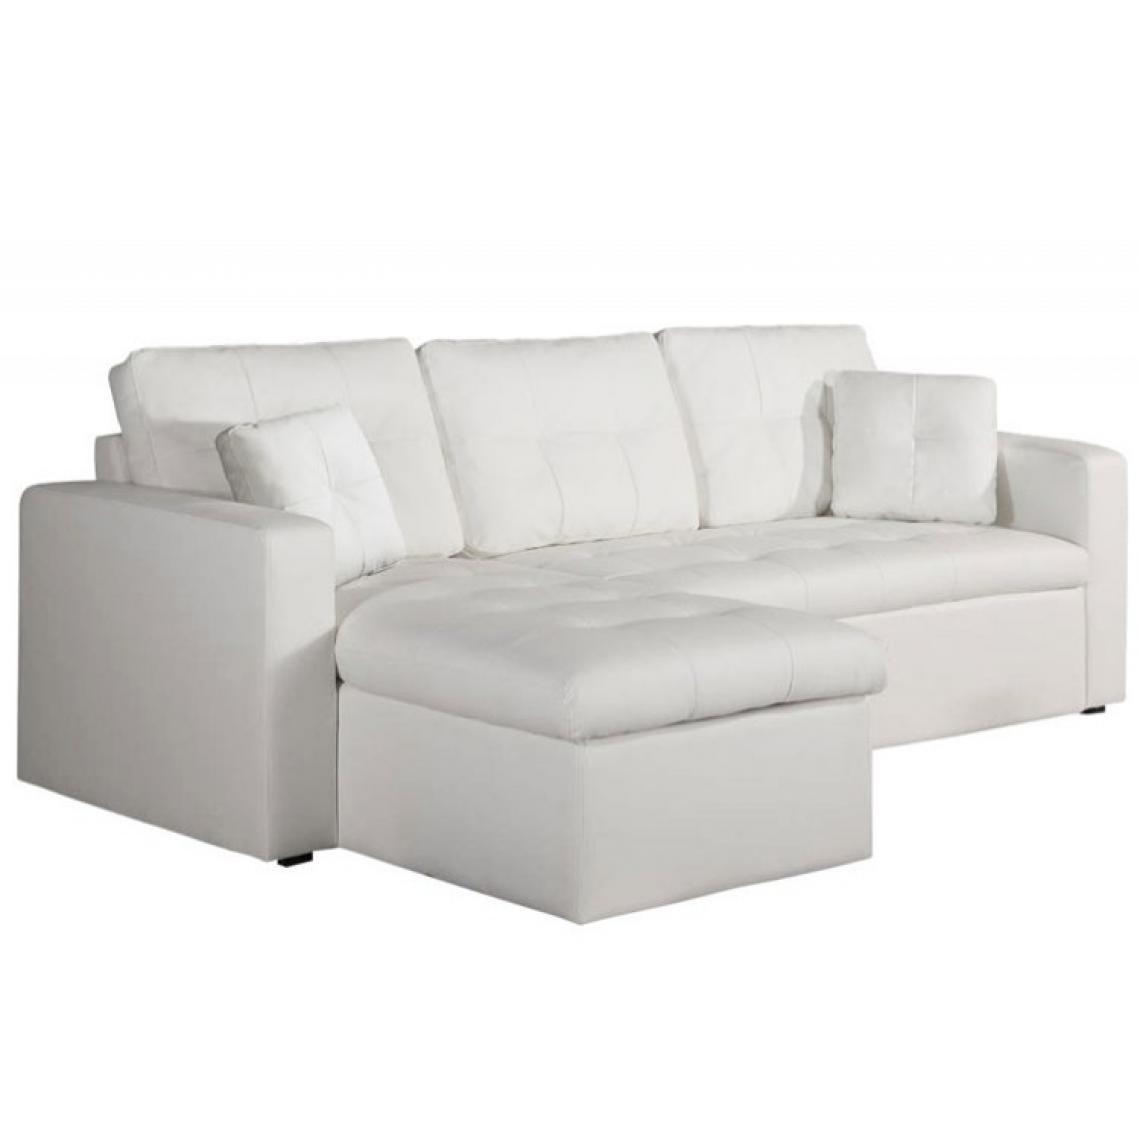 canape d angle modulable et convertible 3 places blanc enzo